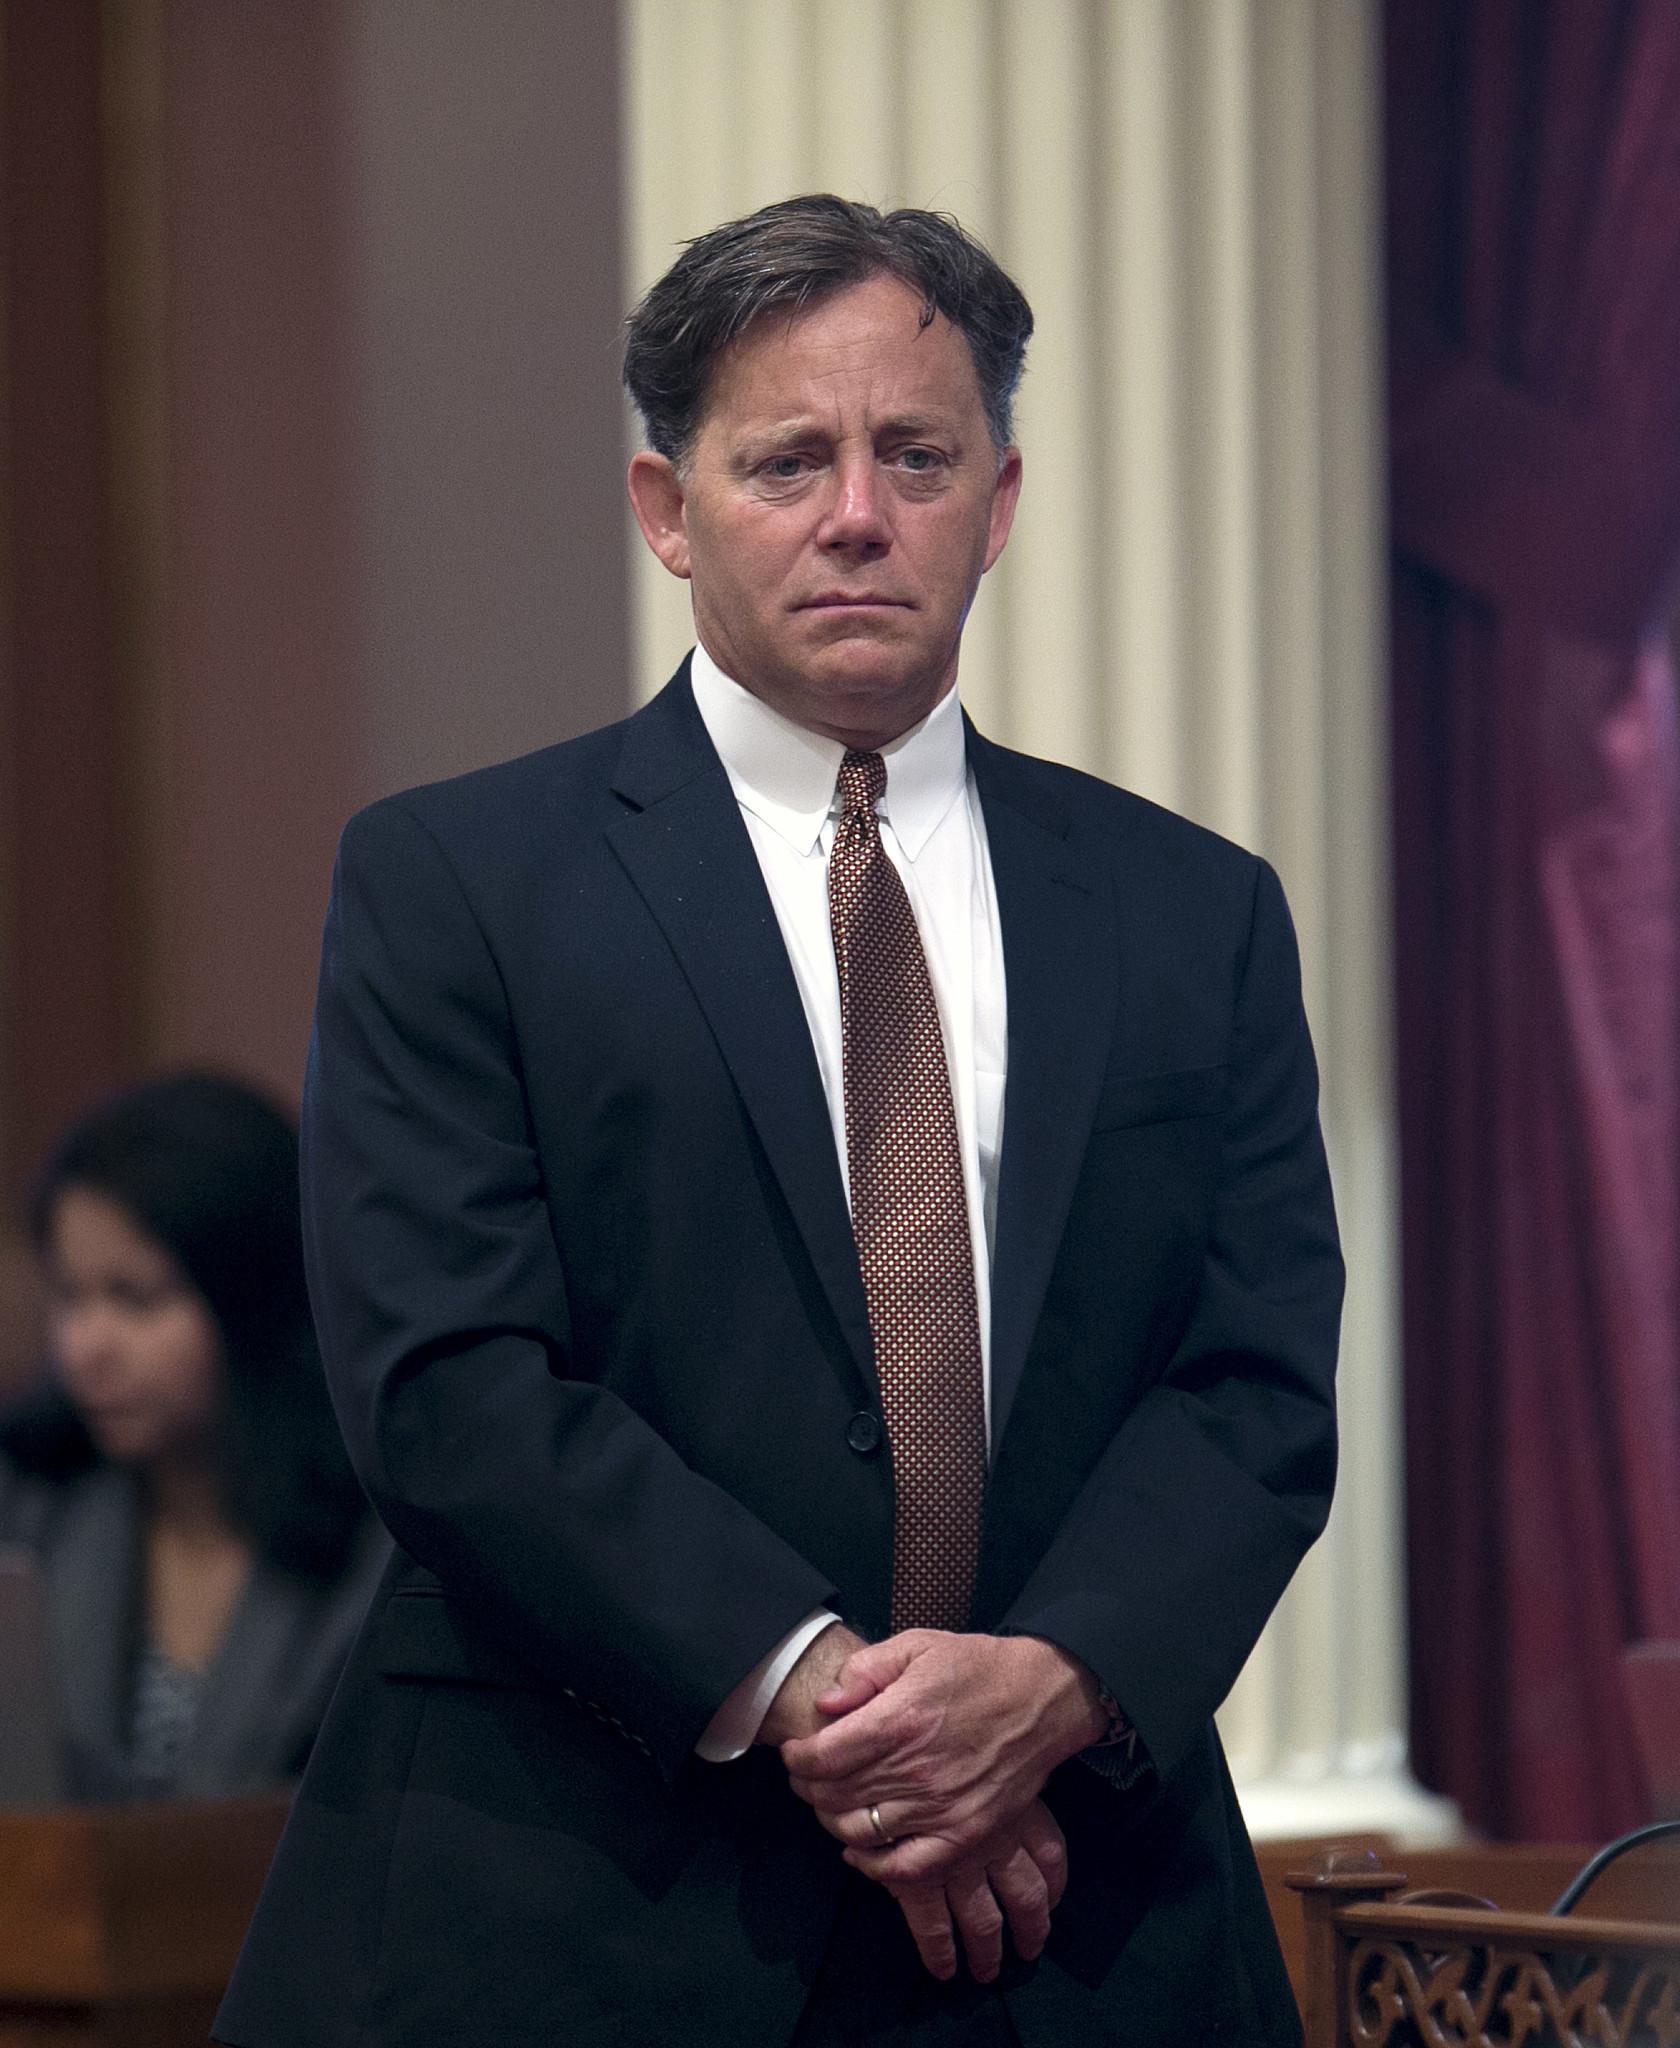 State Sen. Josh Newman (D-Fullerton) at the Capitol on April 20. (Rich Pedroncelli / Associated Press)